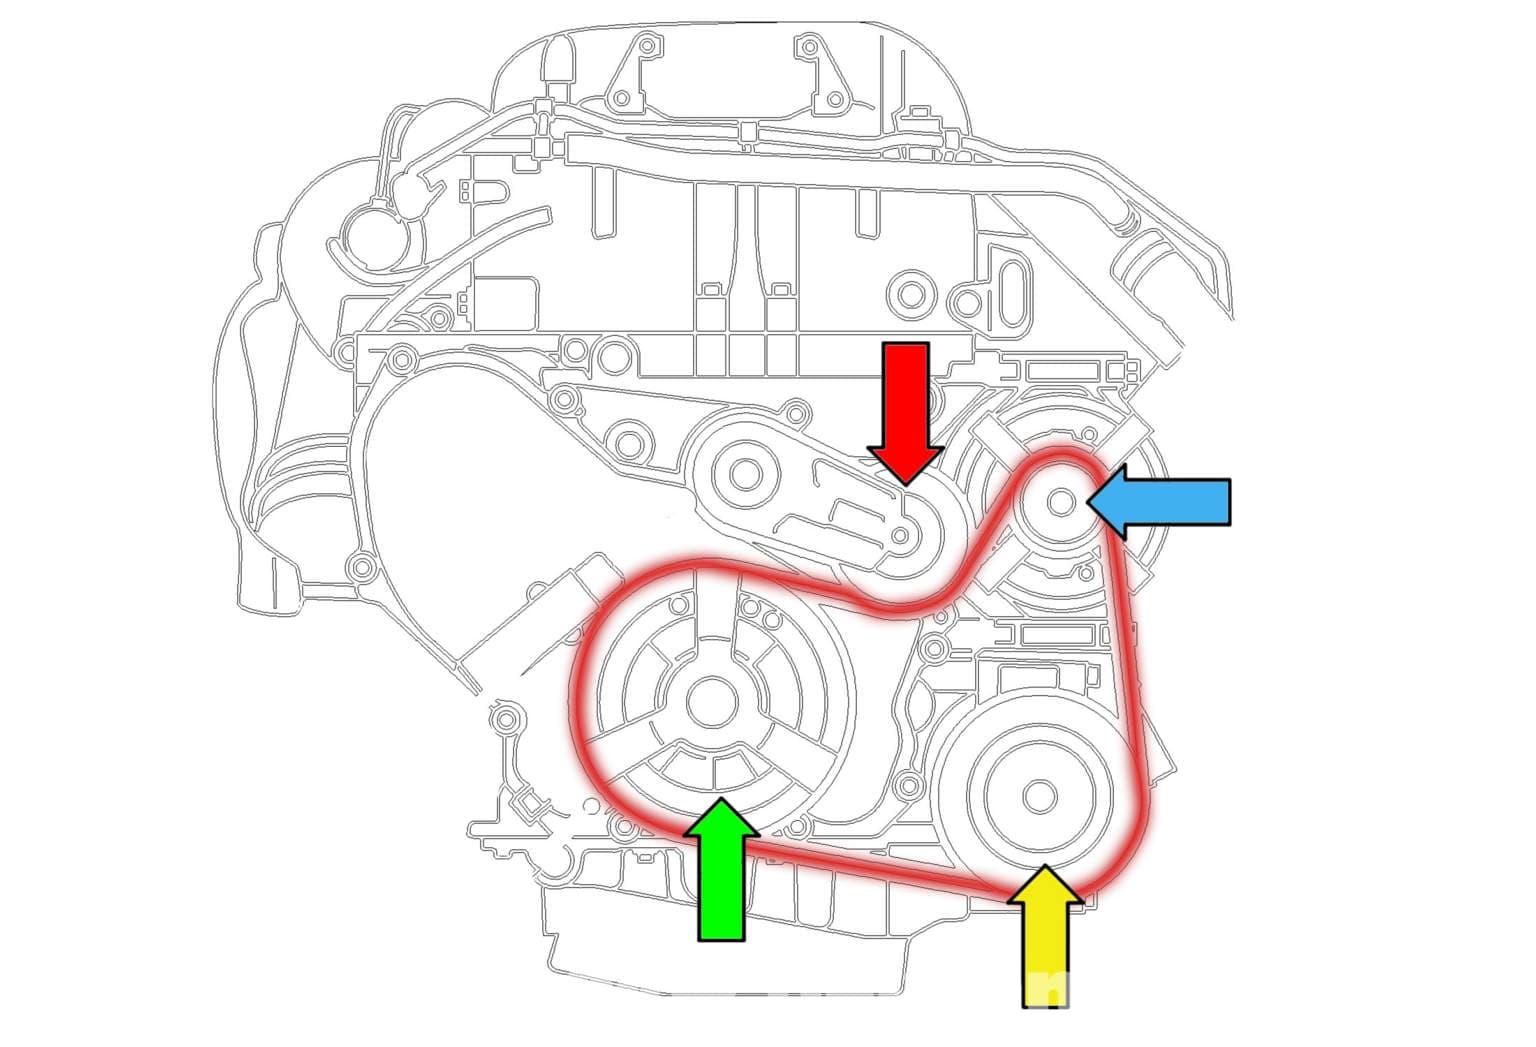 hight resolution of saab 9 3 engine diagram also 99 saab 9 3 serpentine belt on saab 9 3 2006 saab 9 3 engine diagram